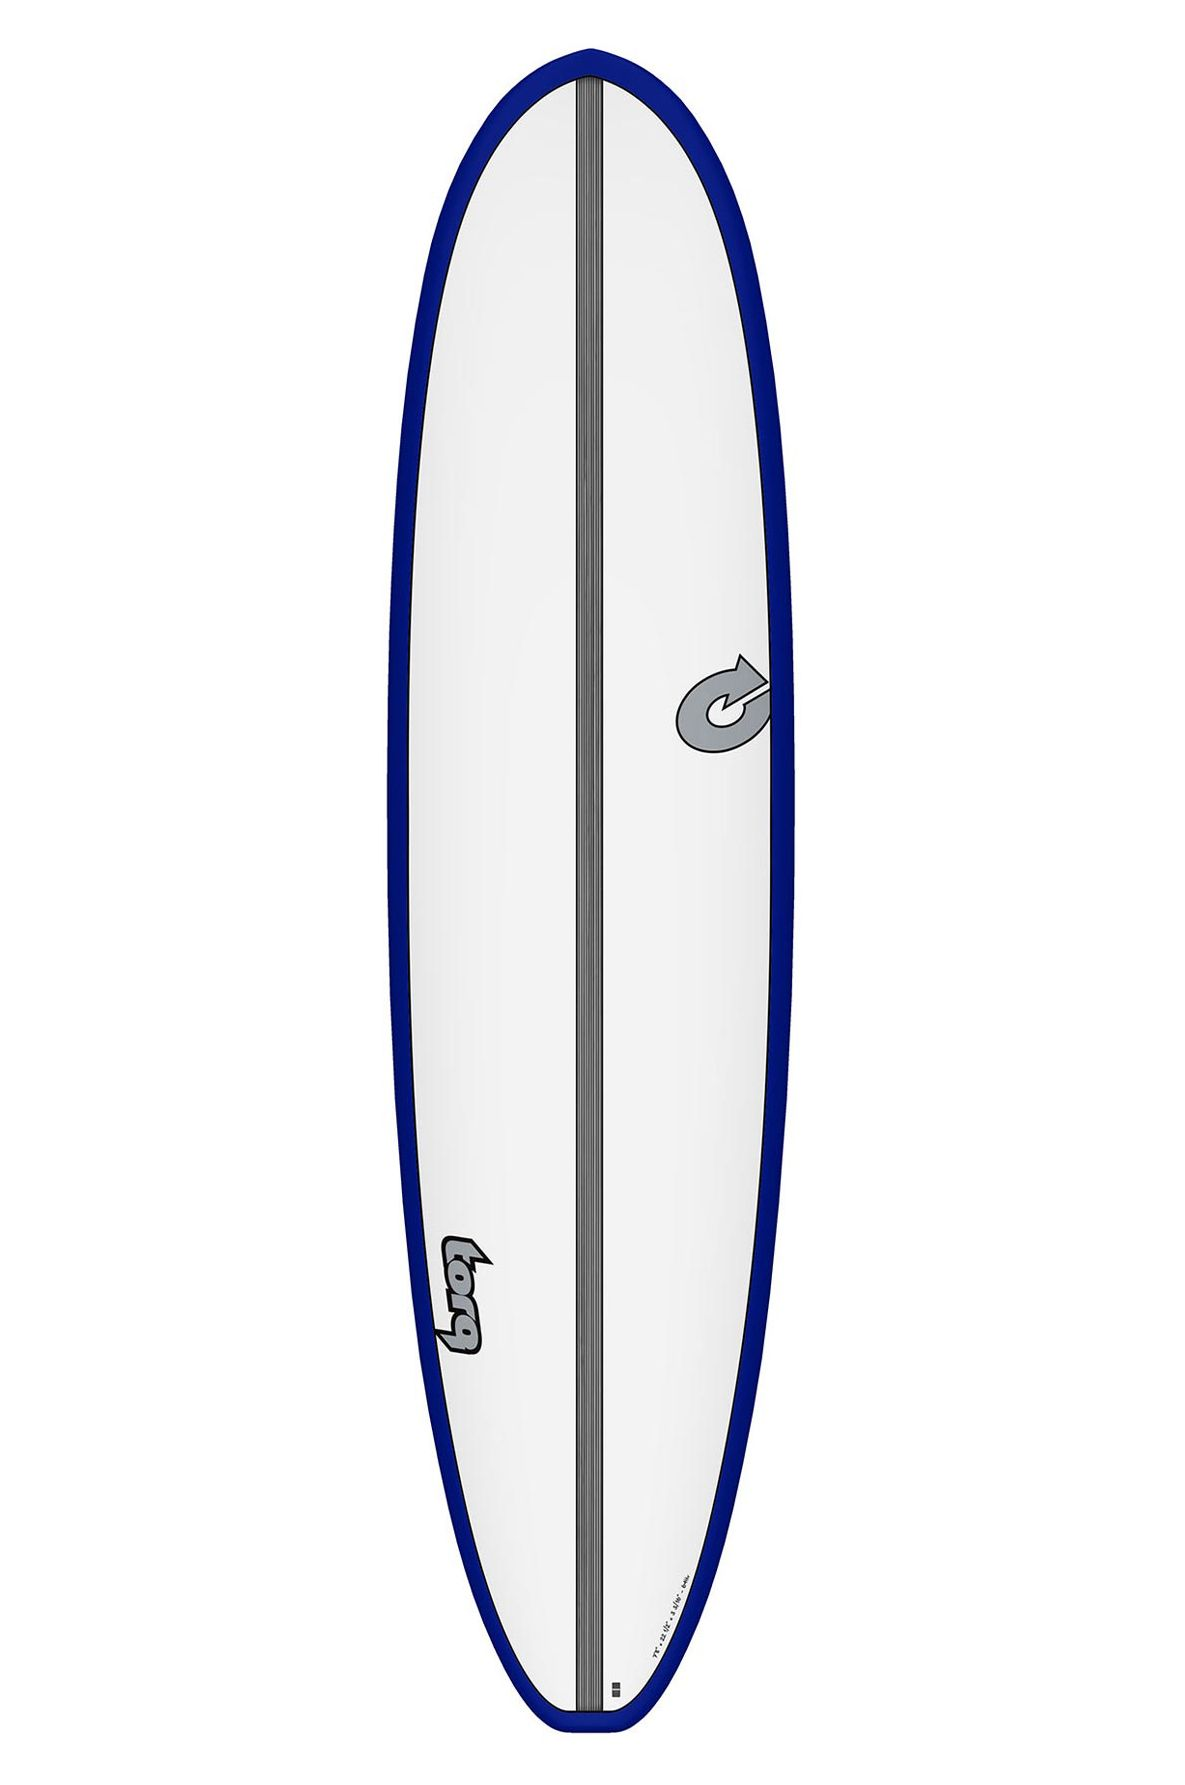 Prancha Surf Torq 7'8 MOD FUN WHITE + RFLX BLUE + CARBON STRIPE Squash Tail - Color Futures 7ft8